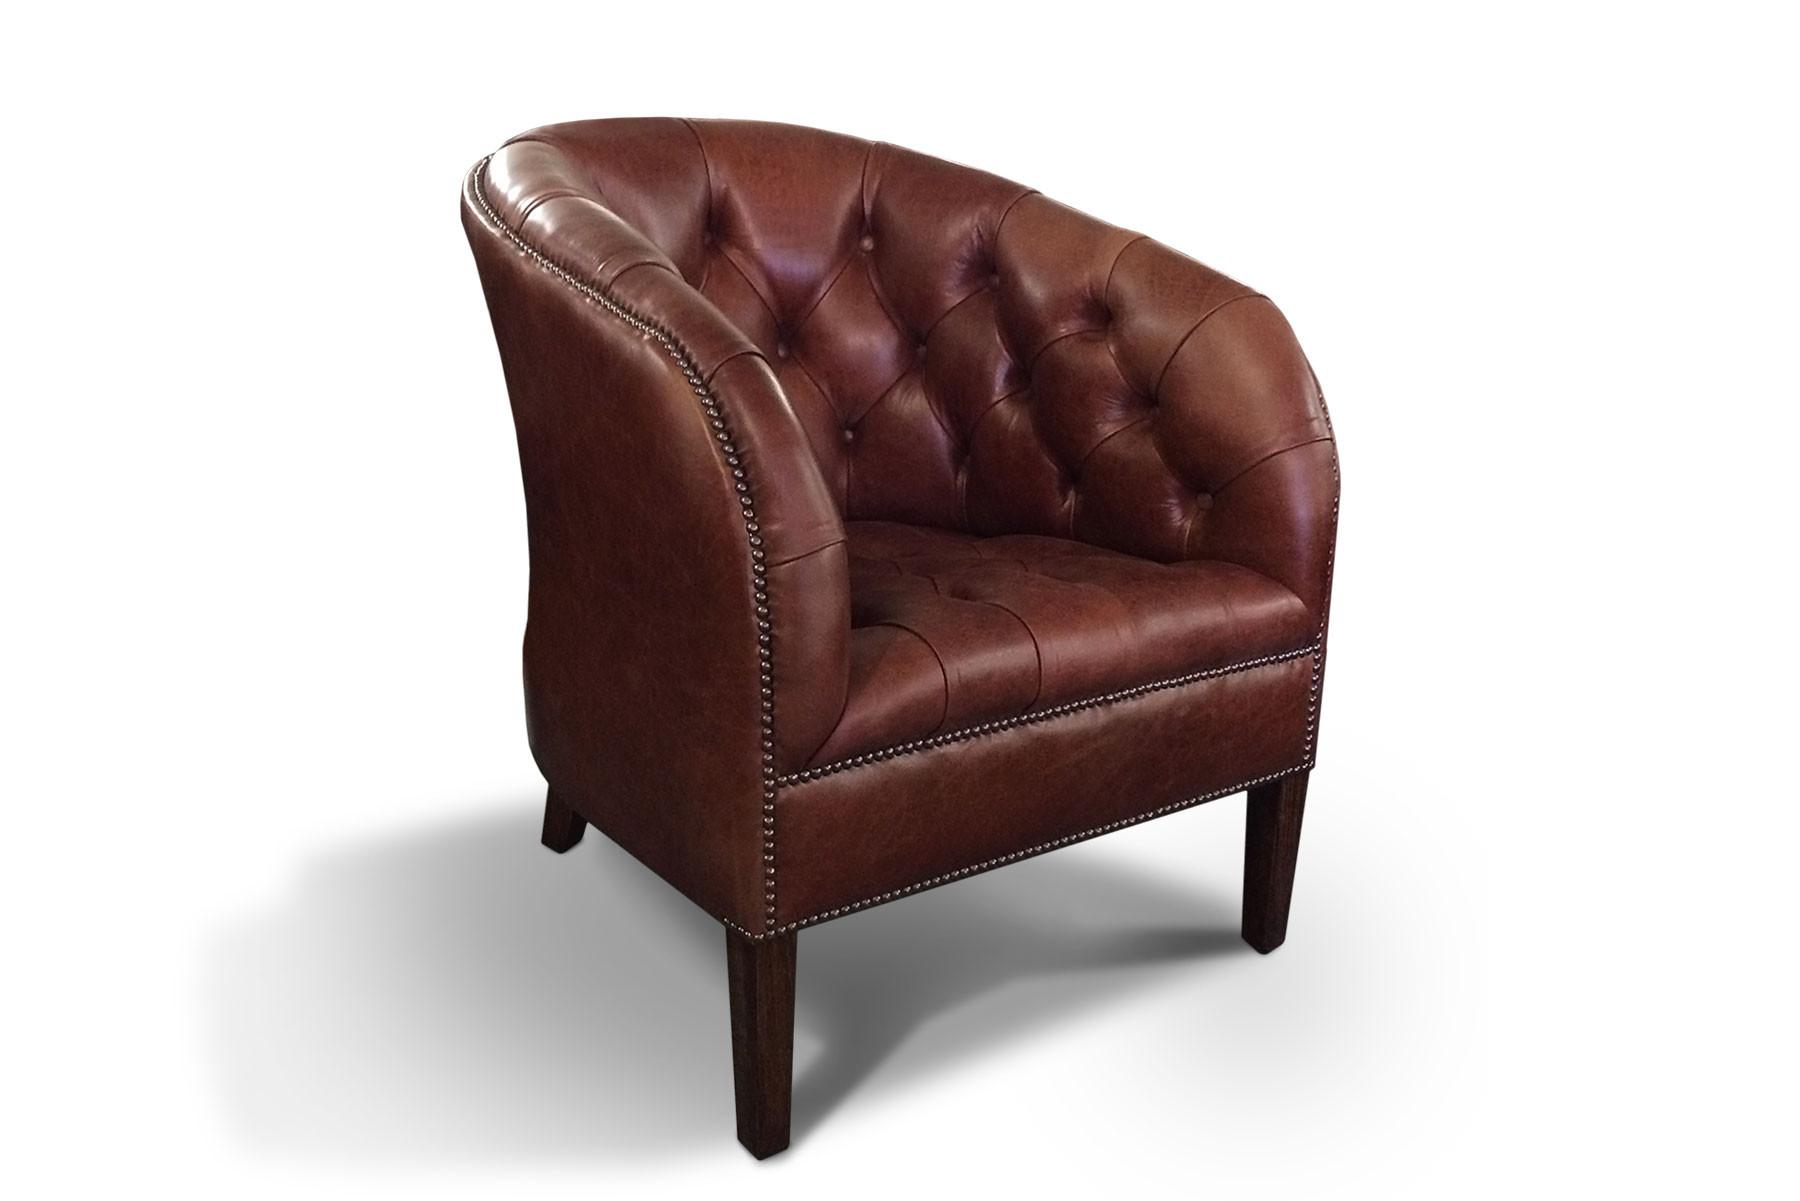 jasper chair company potty chairs for seniors